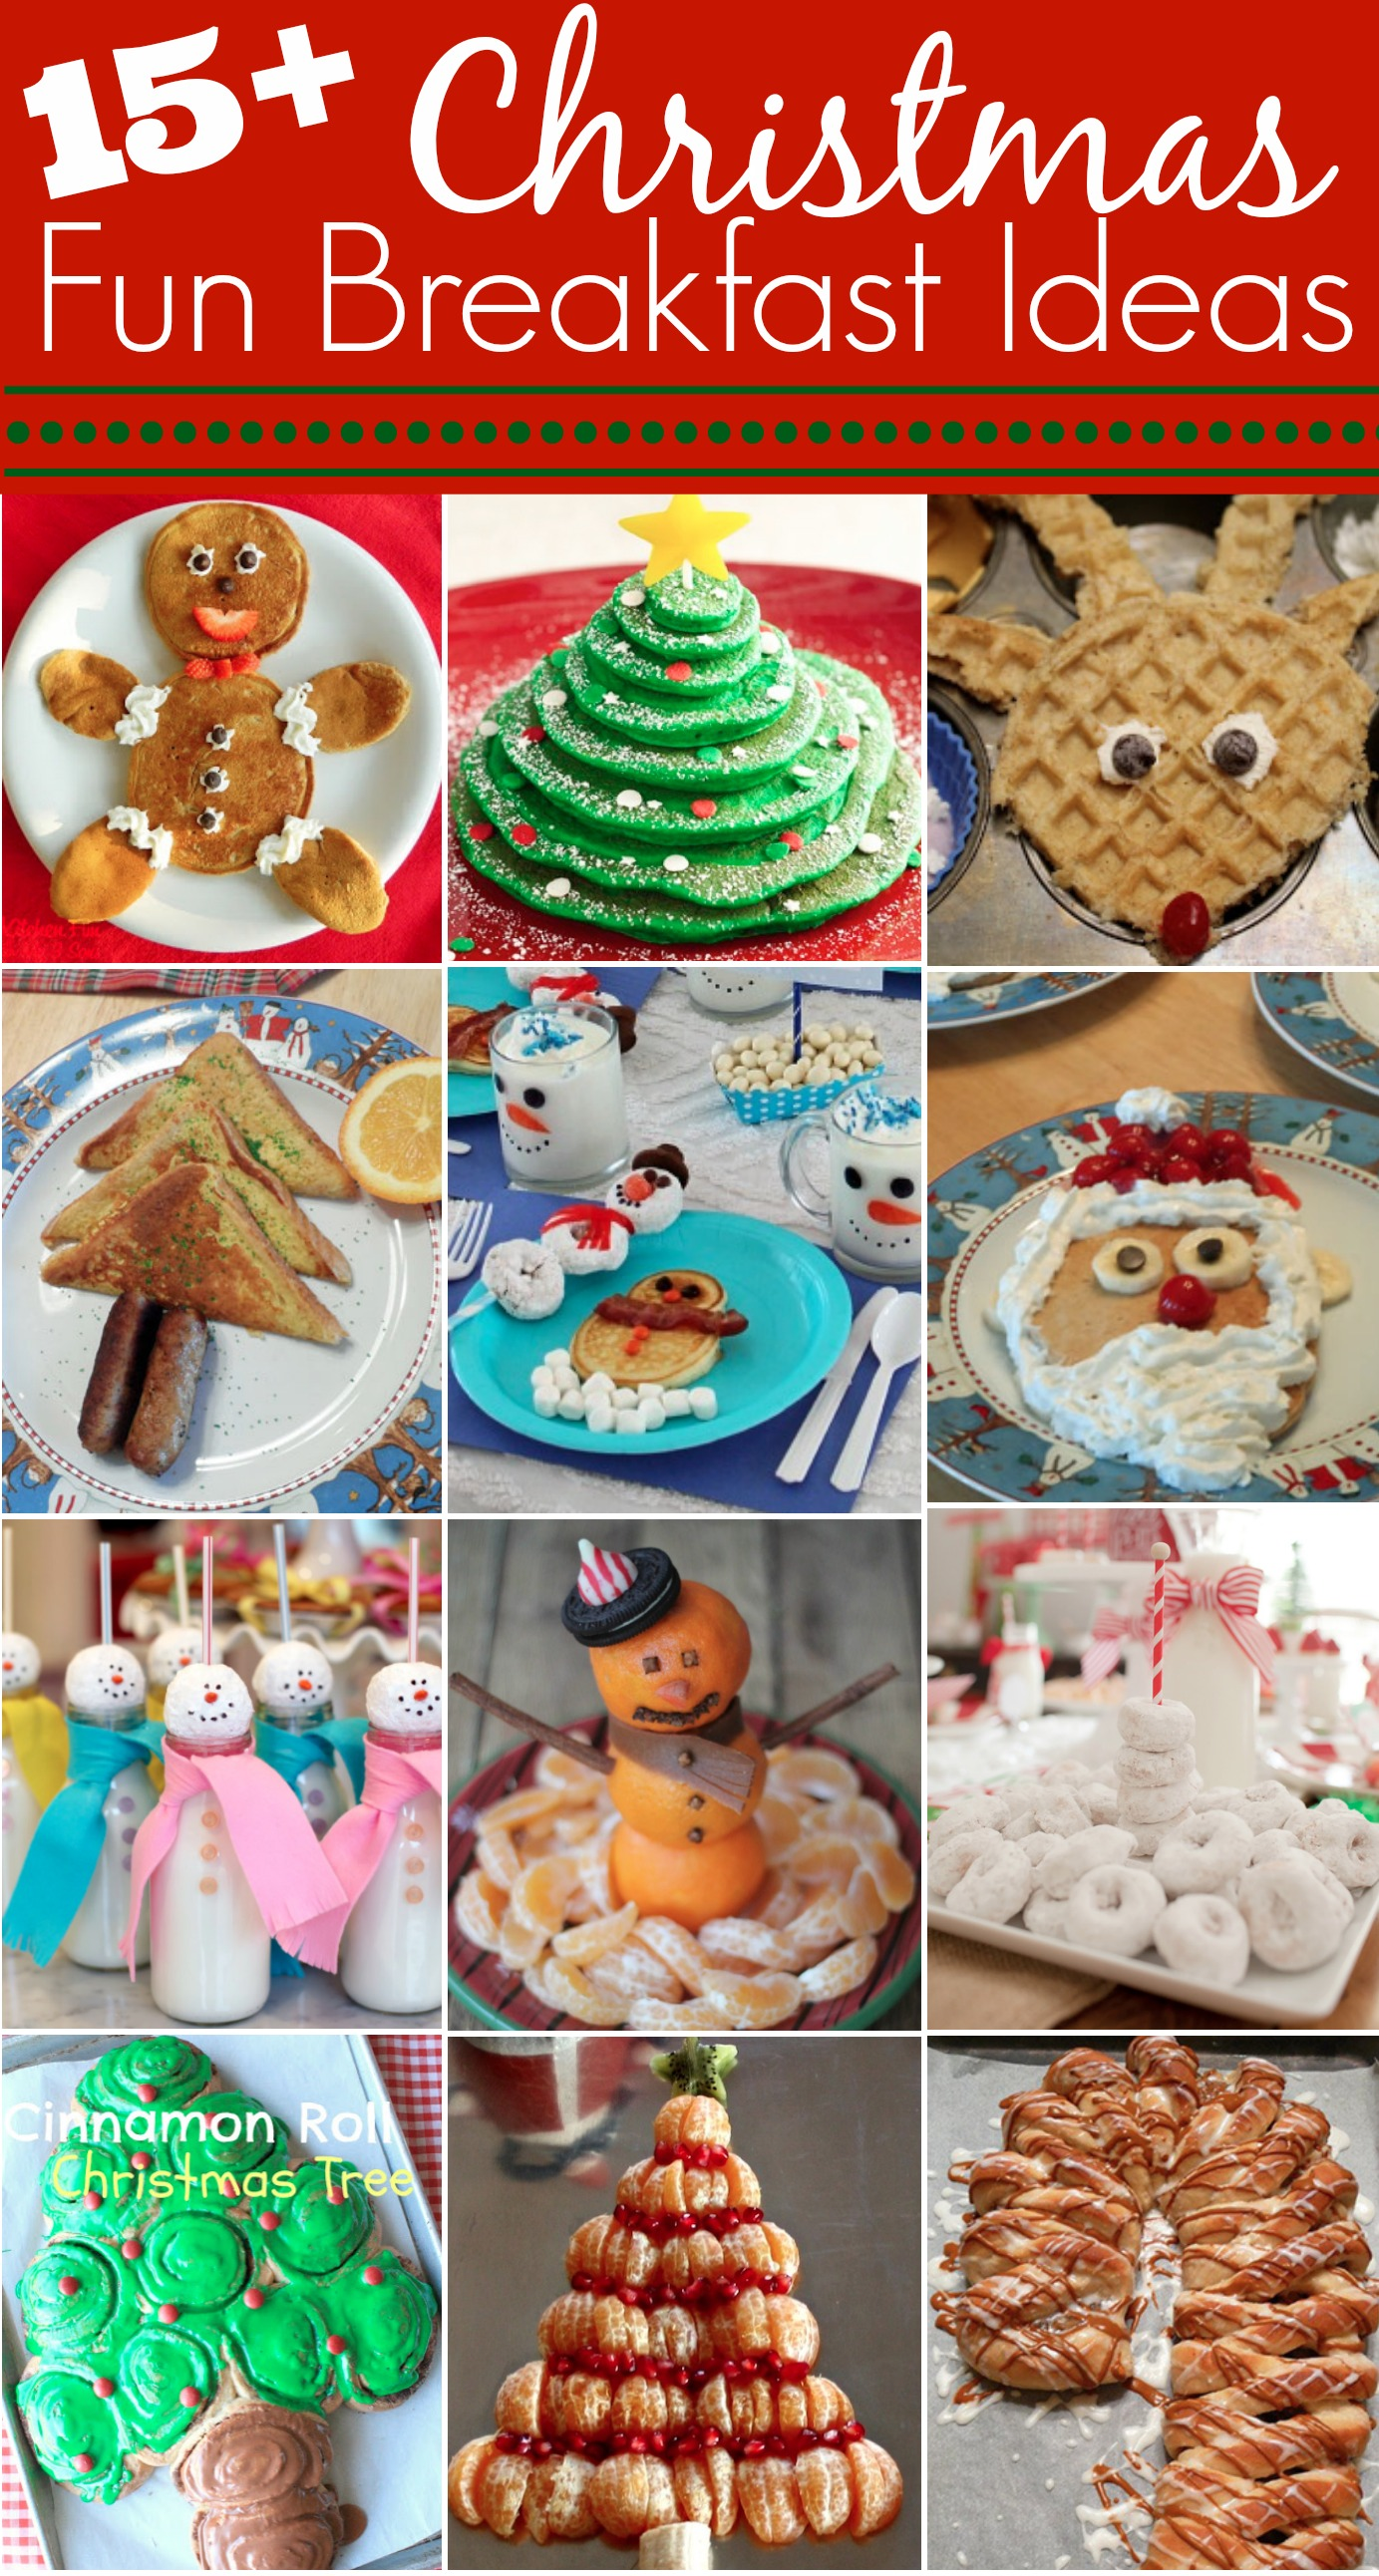 15 fun christmas breakfast